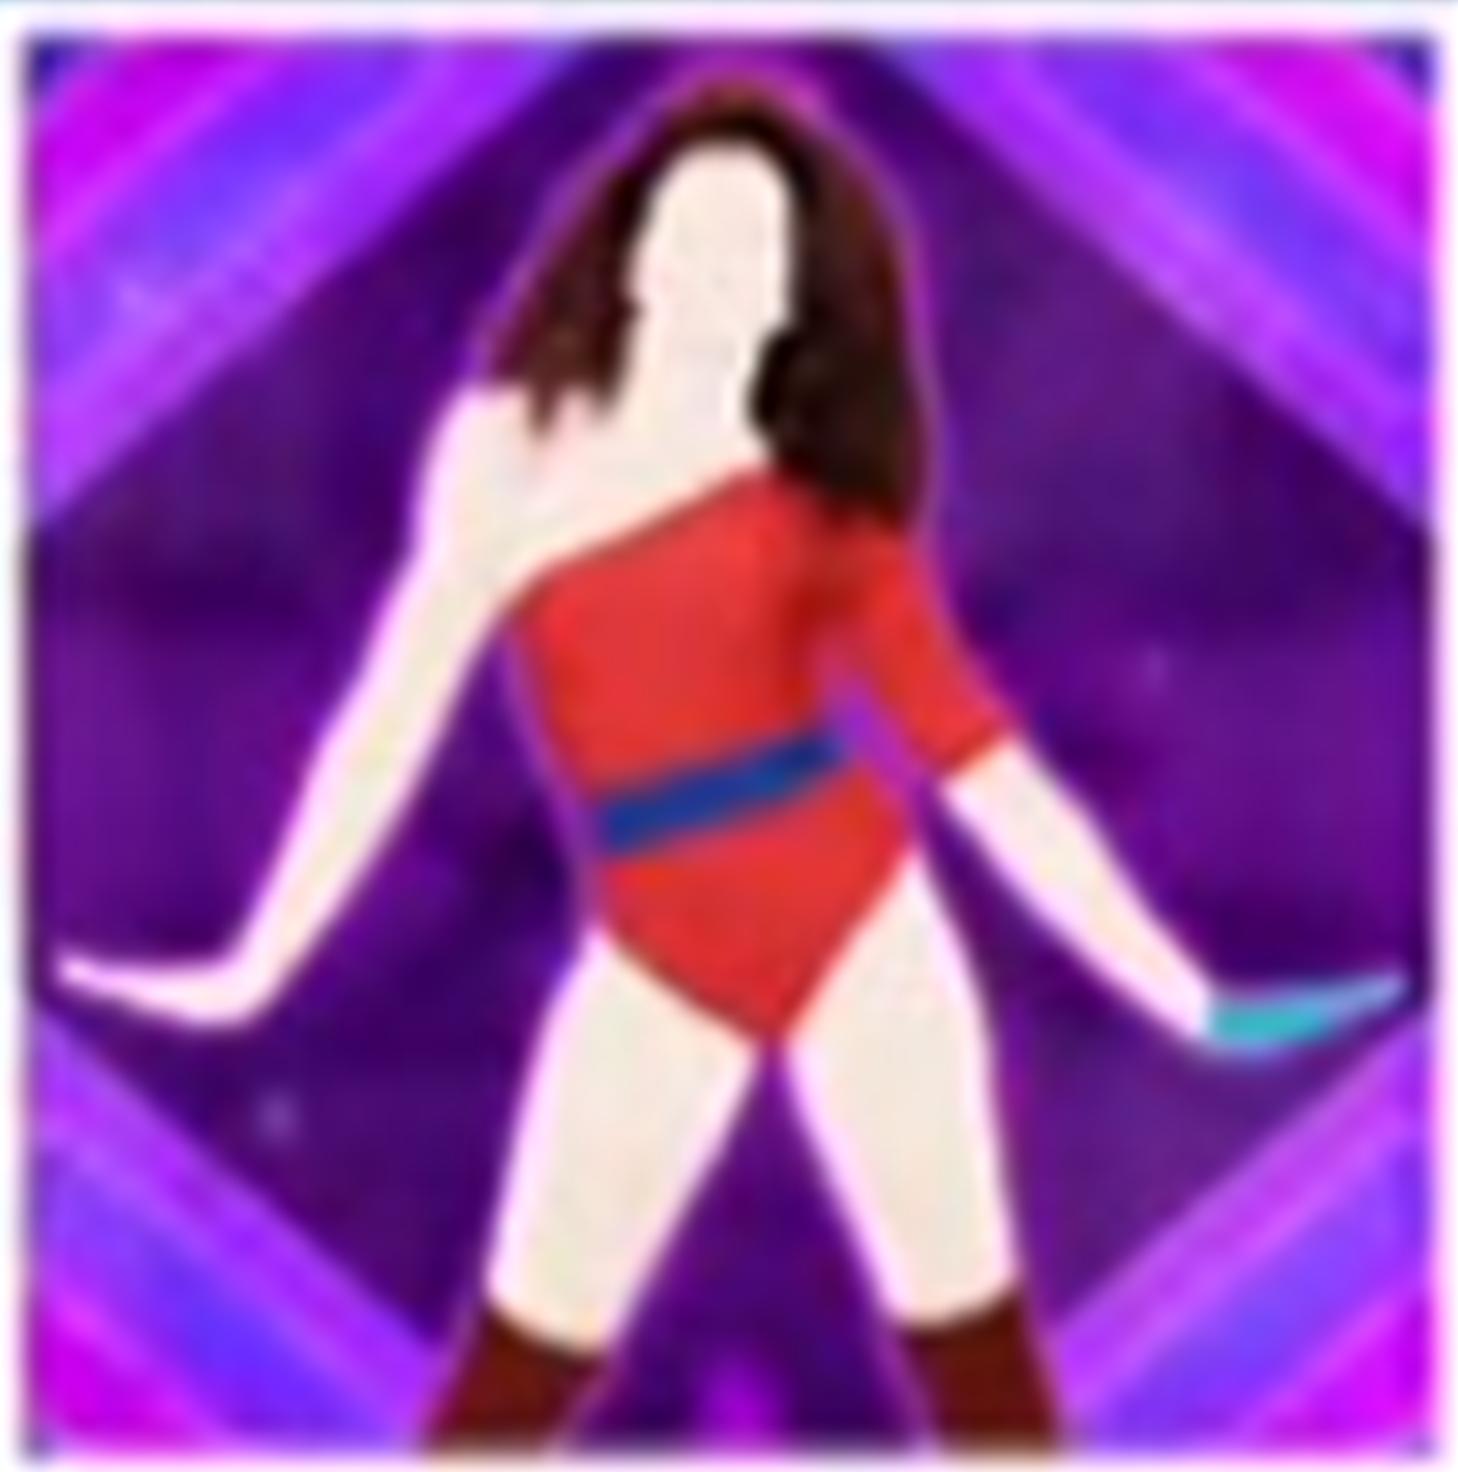 Balkan blast remix (temporary) mashup icon